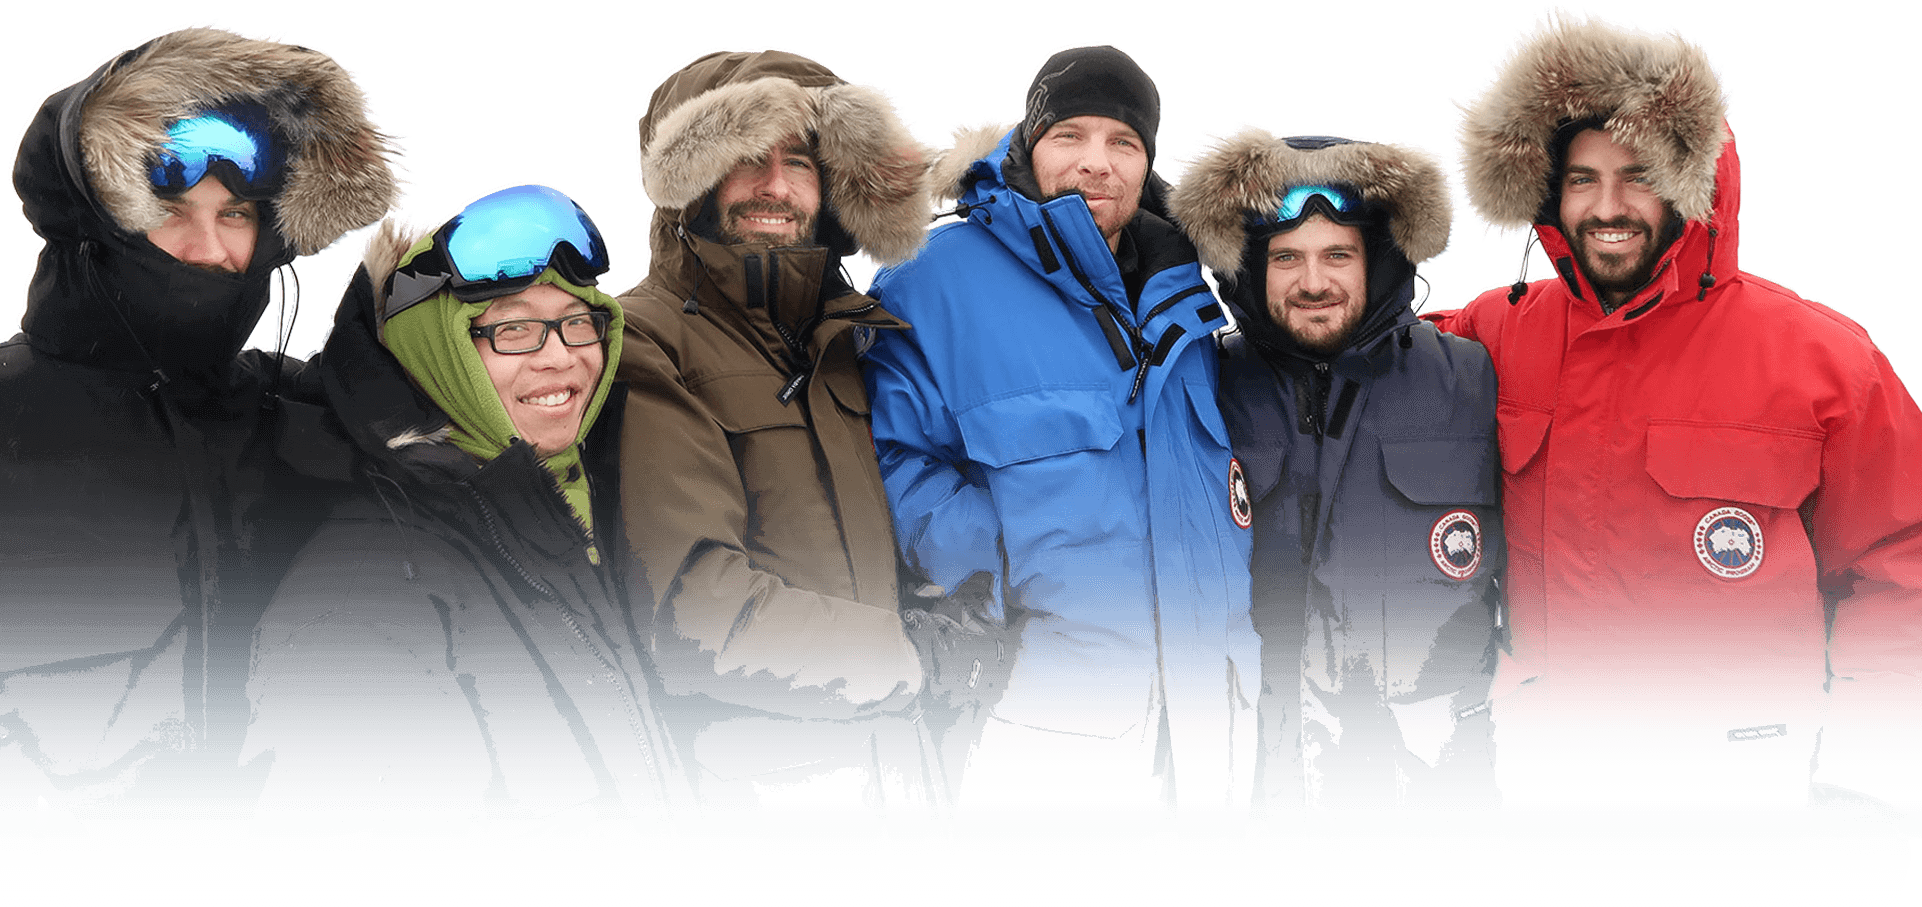 Group of people wearing heavy winter parkas